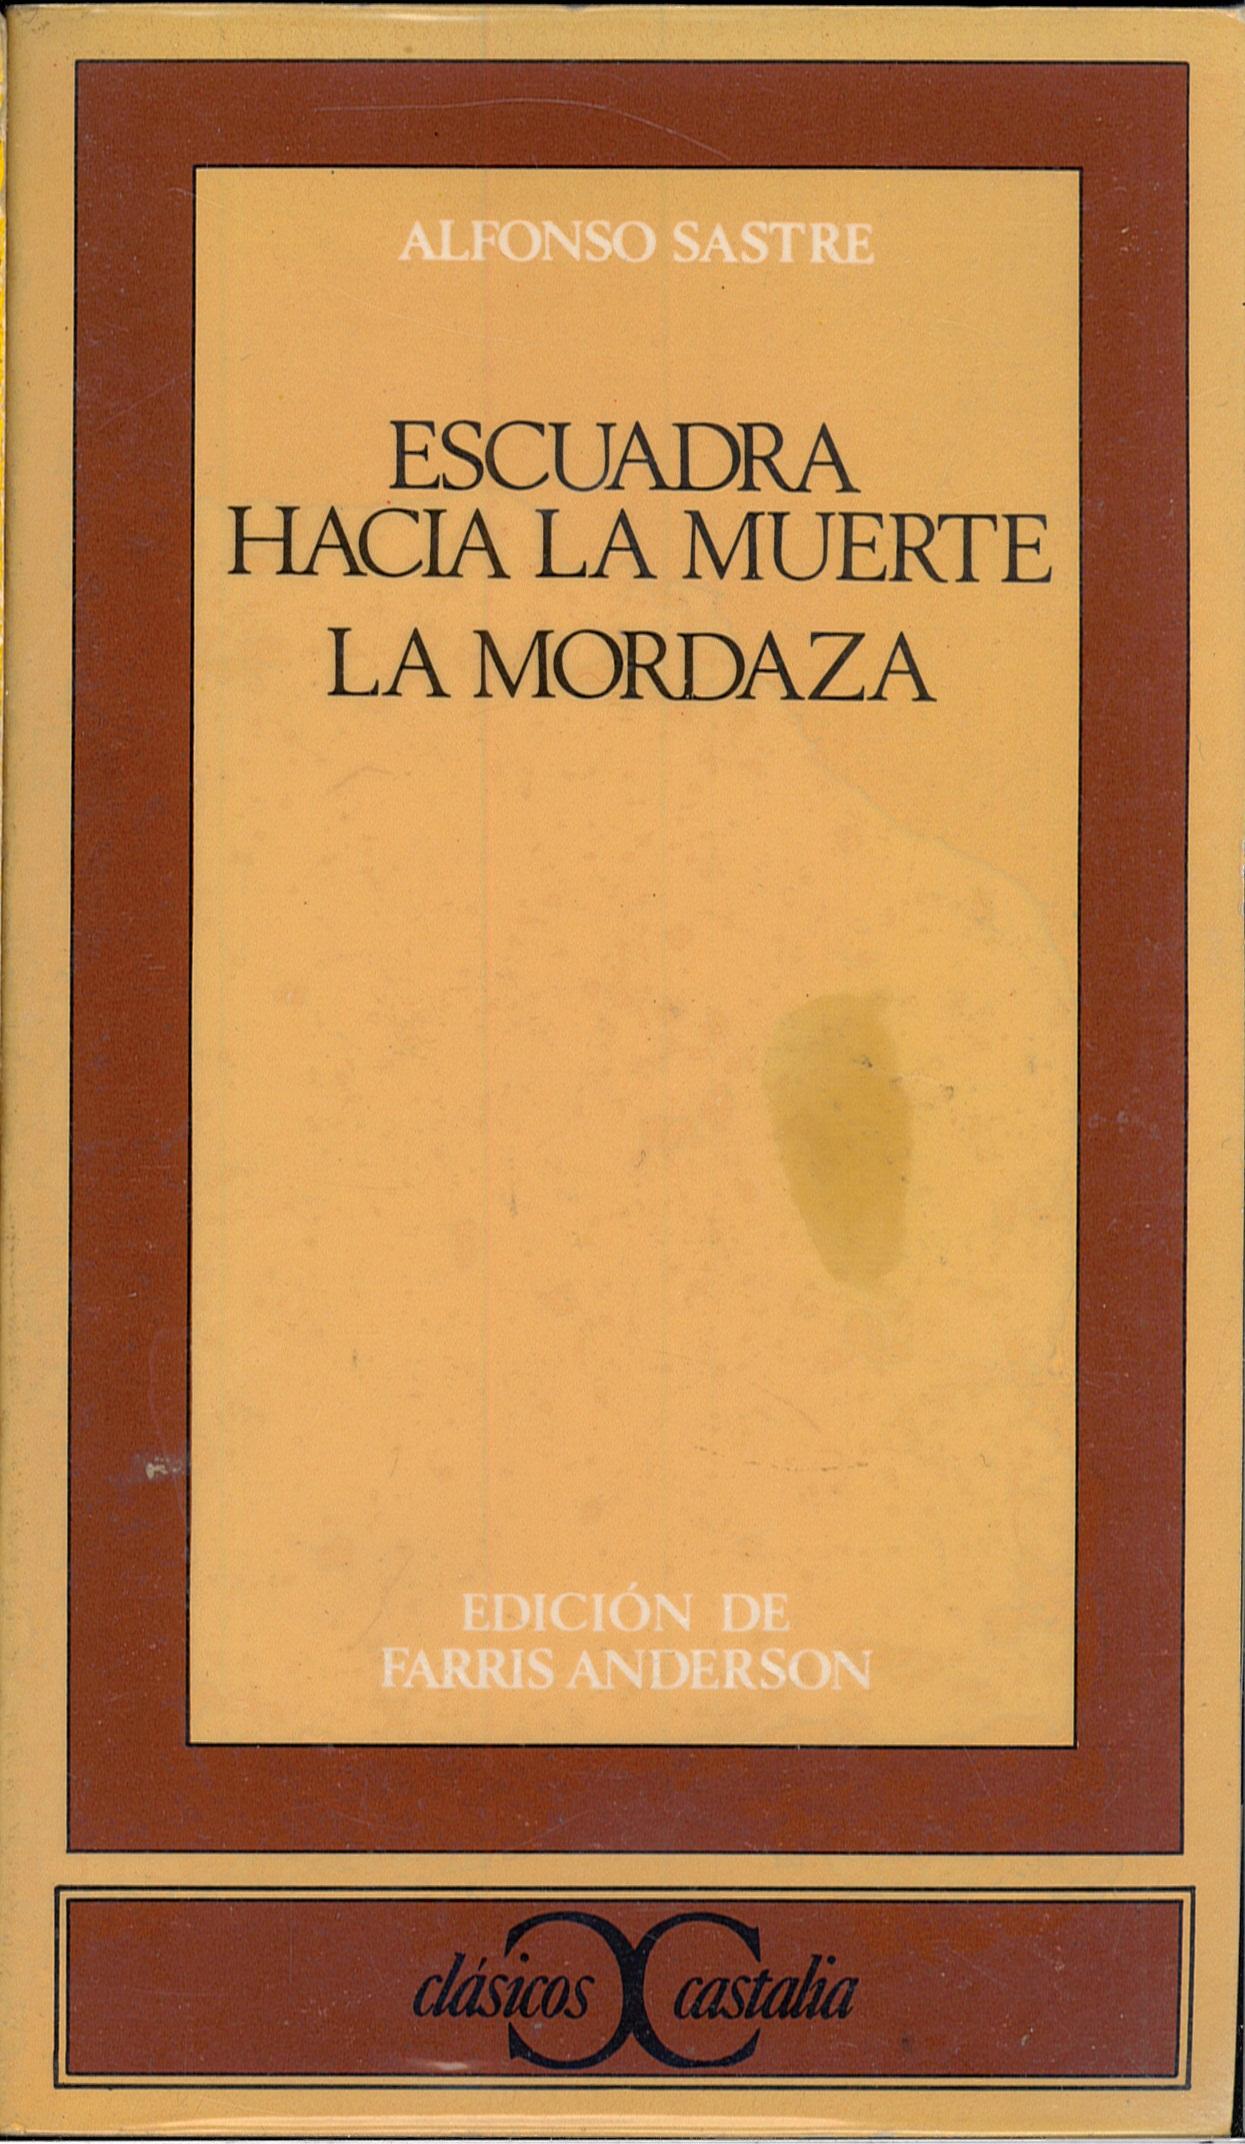 ESCUADRA HACIA LA MUERTE – LA MORDAZA (Alfonso Sastre).